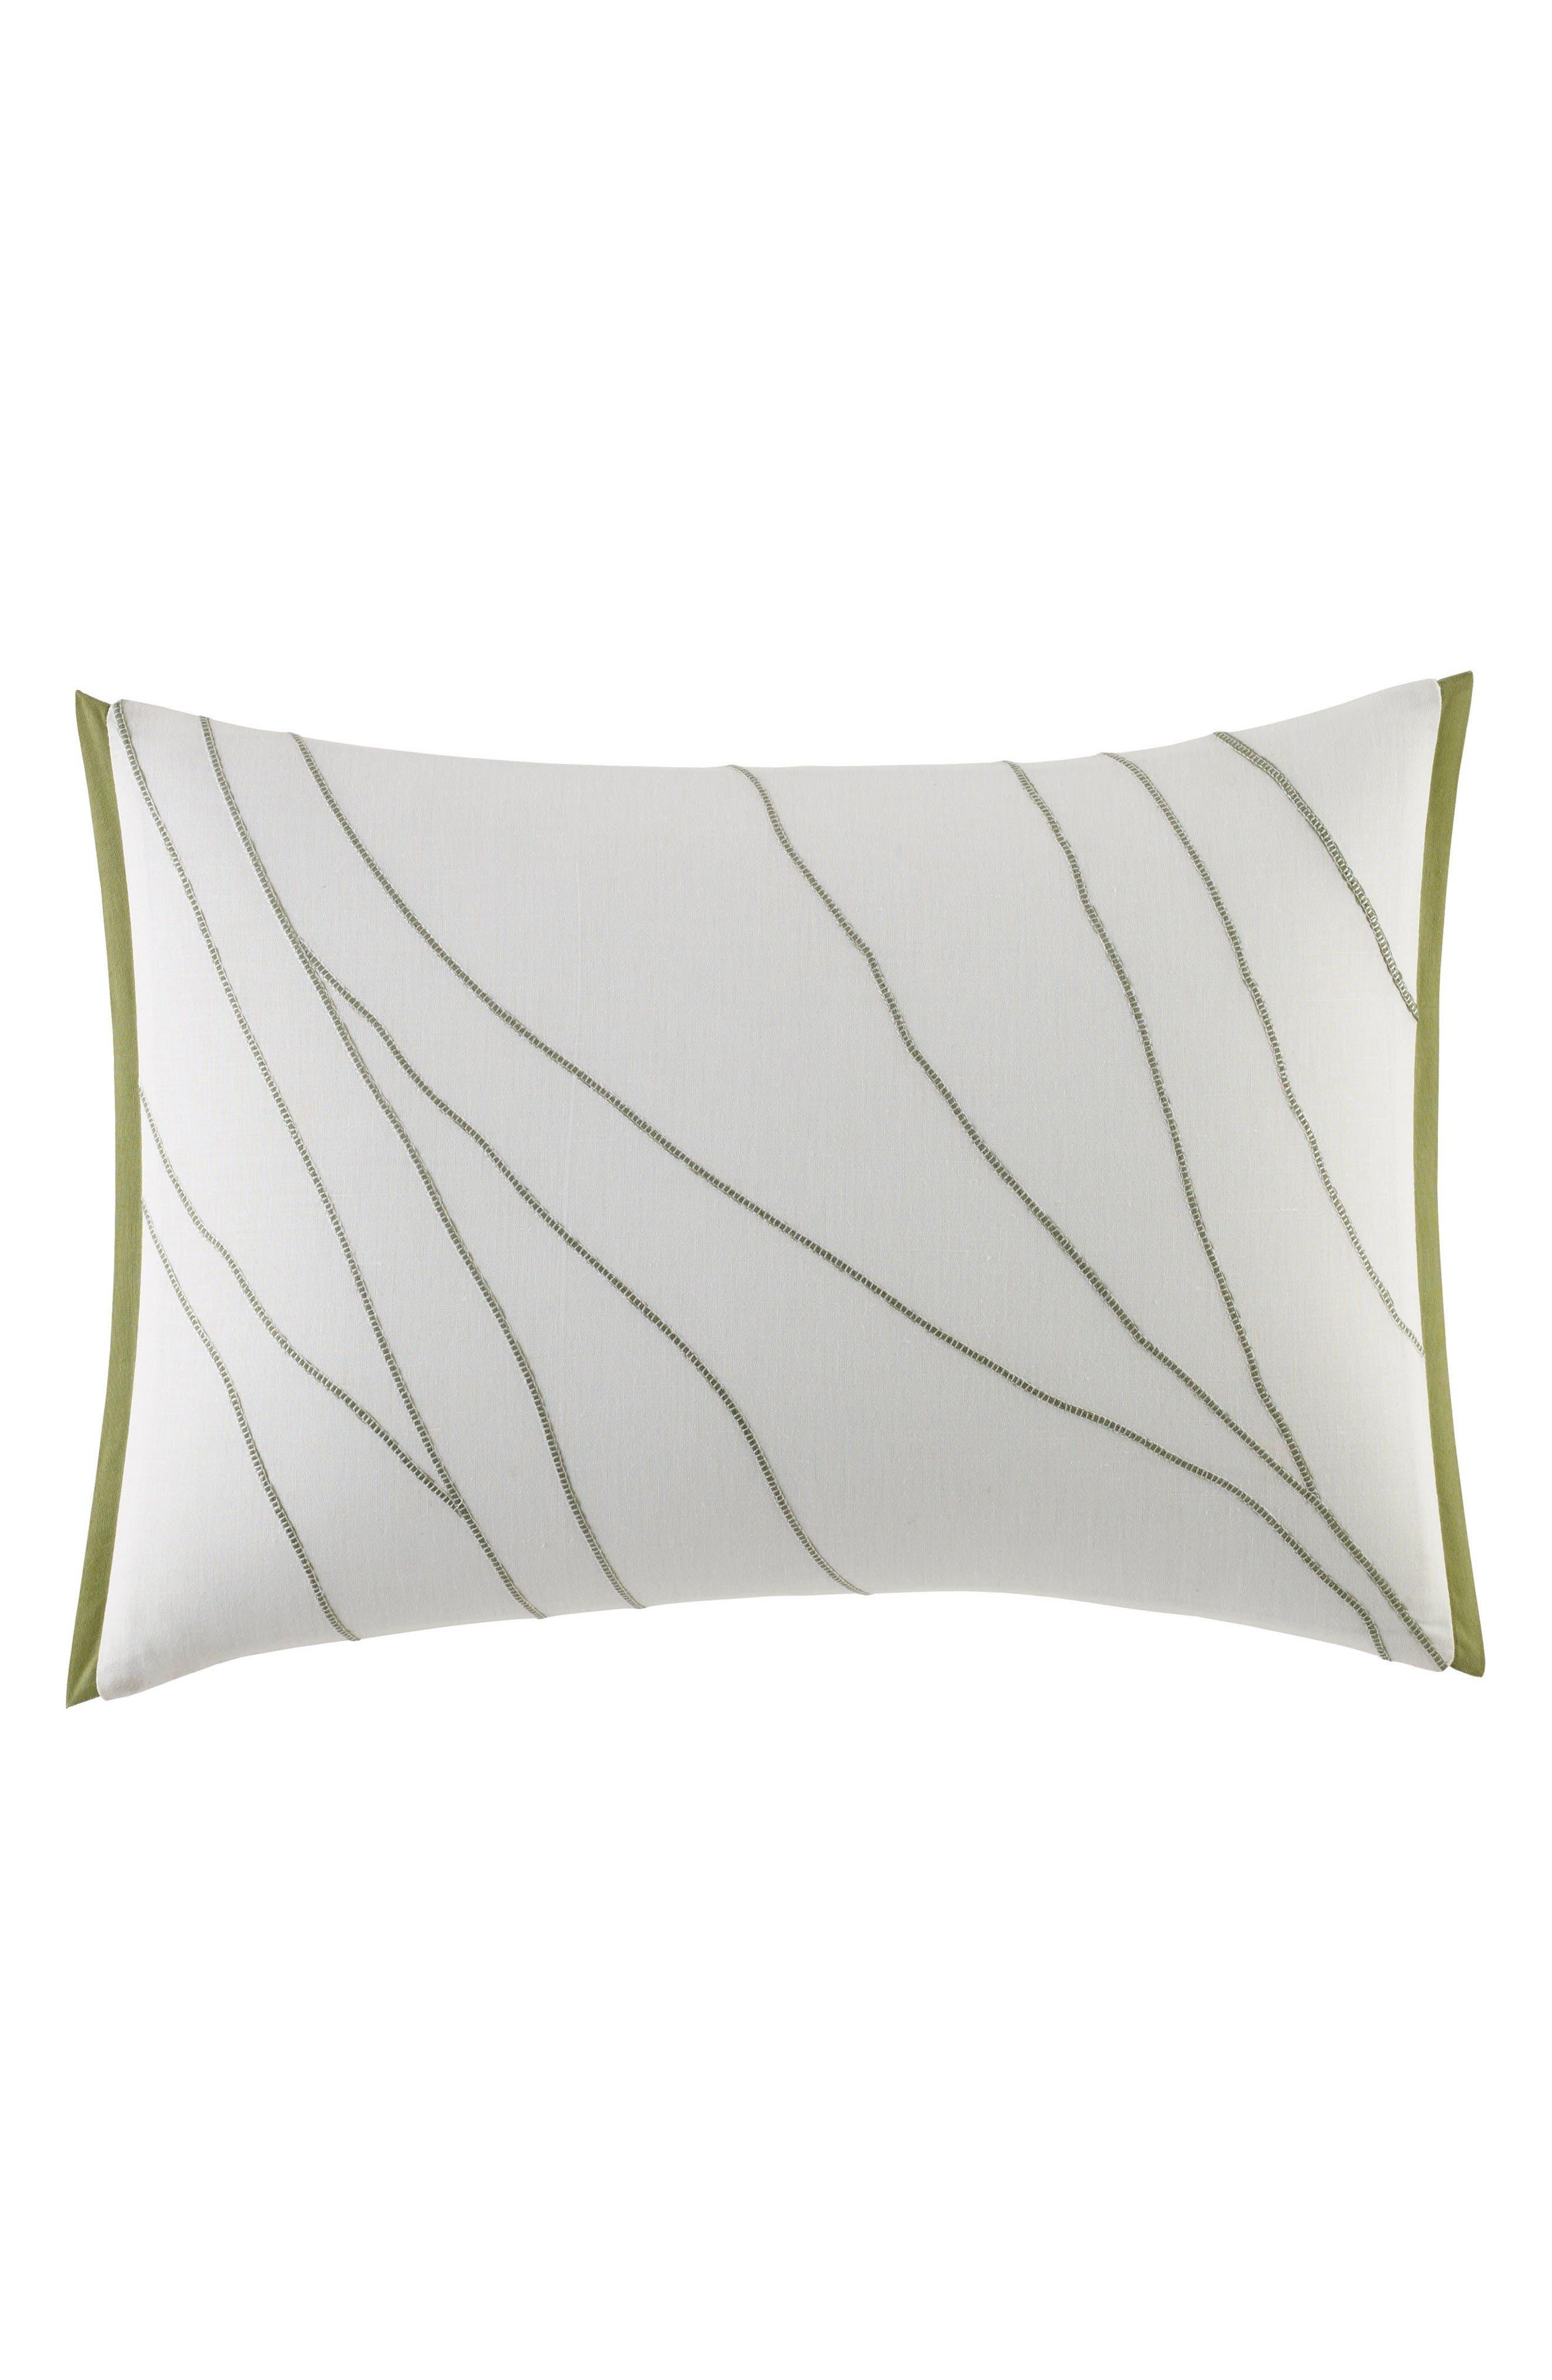 Vera Wang Dragonfly Accent Pillow